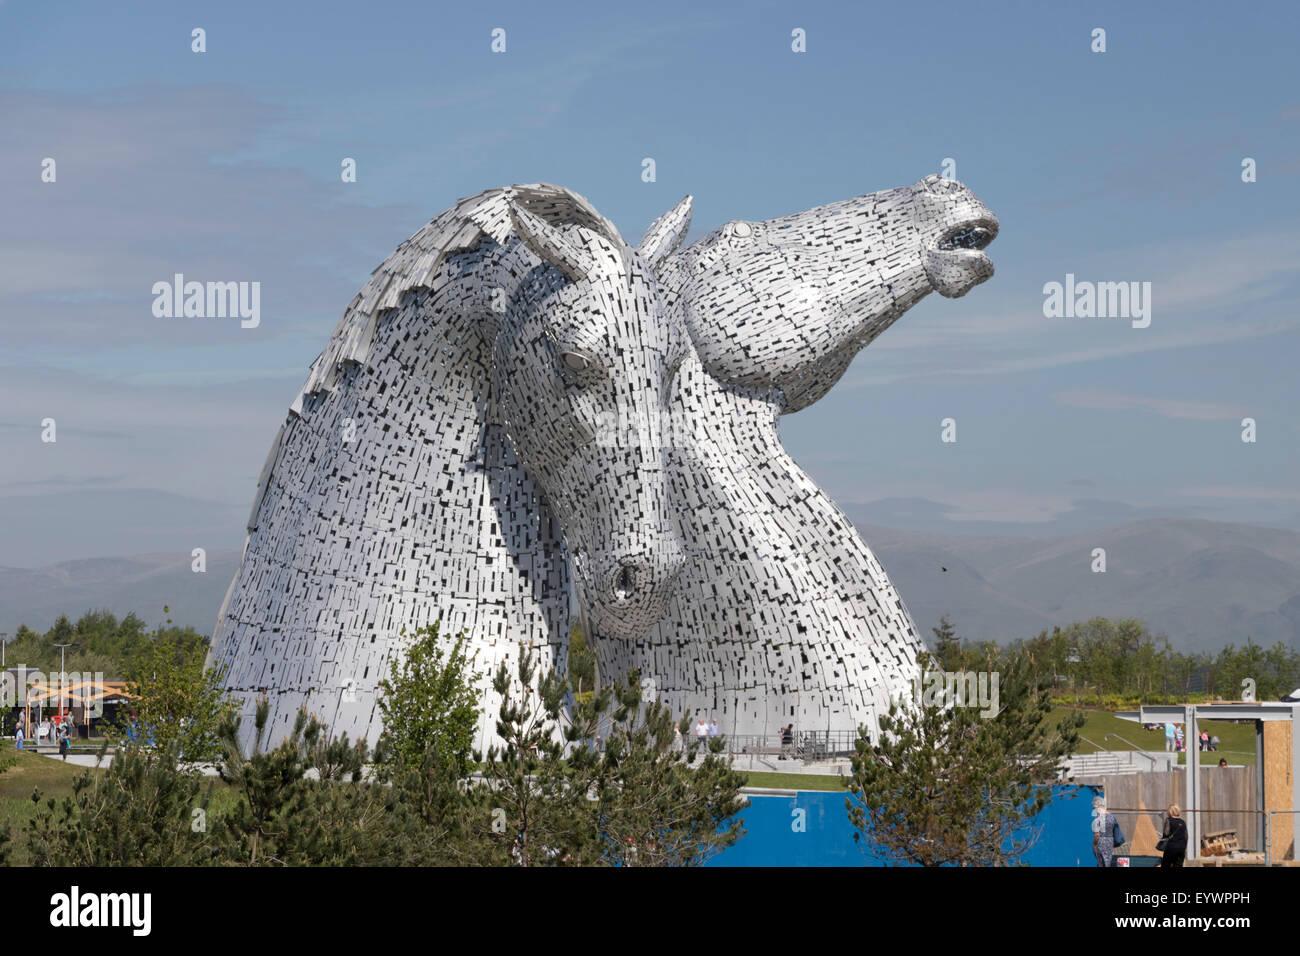 The Kelpies by Andy Scott, Helix Park, Falkirk, Scotland, United Kingdom, Europe - Stock Image